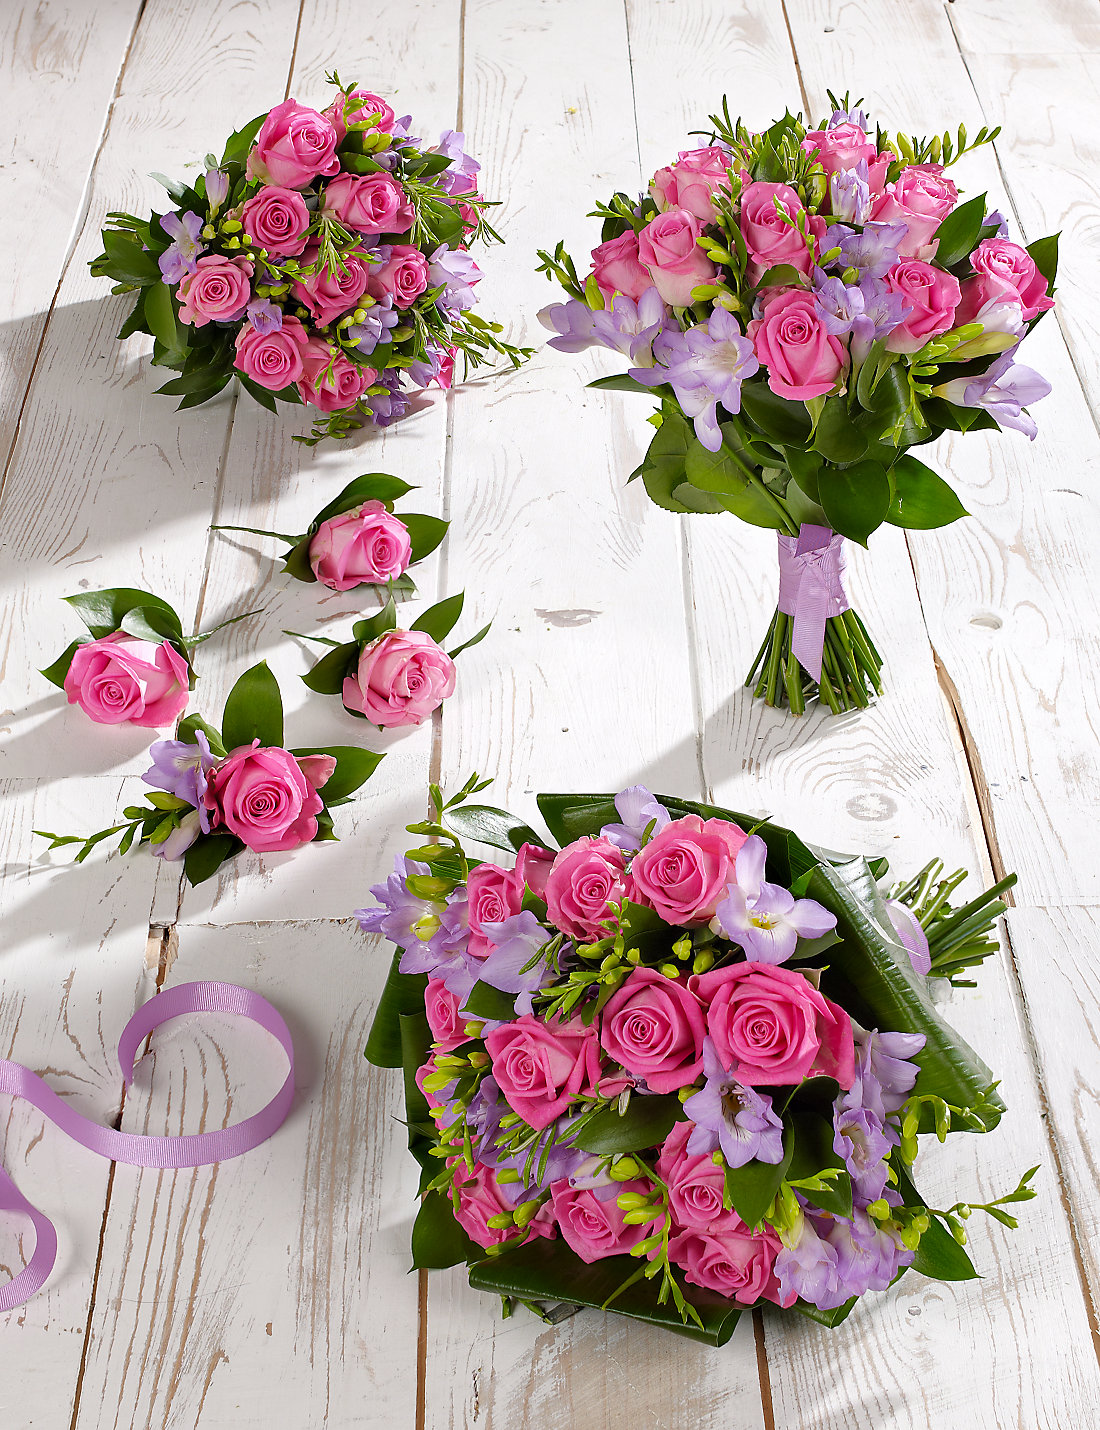 murambiroses co flowers for weddings FLOWER ARRANGEMENTS